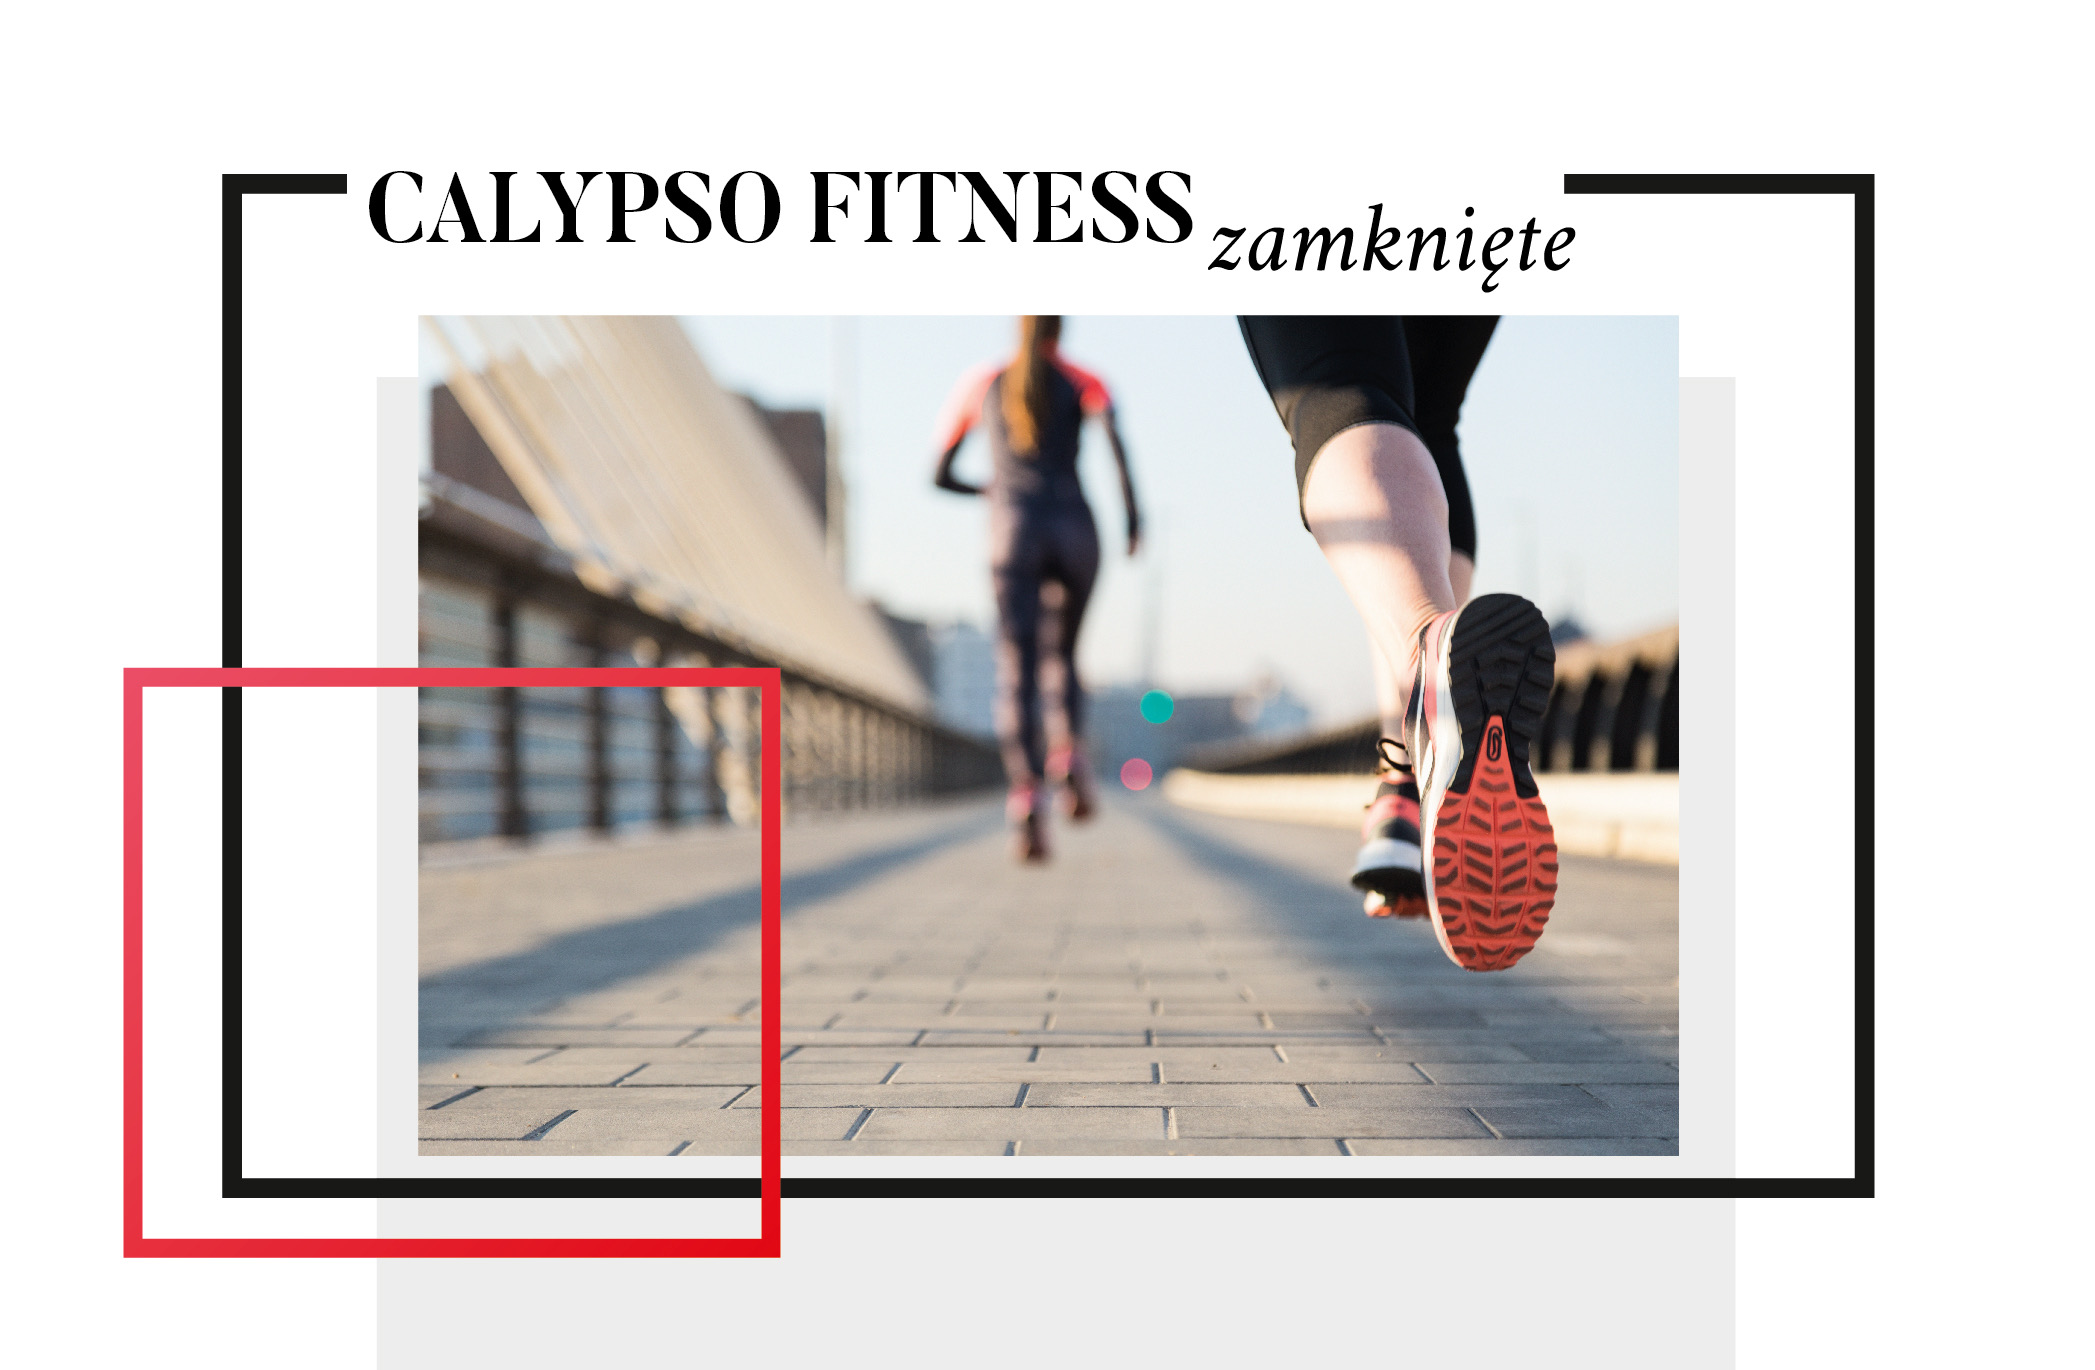 Calypso Fitness zamknięte